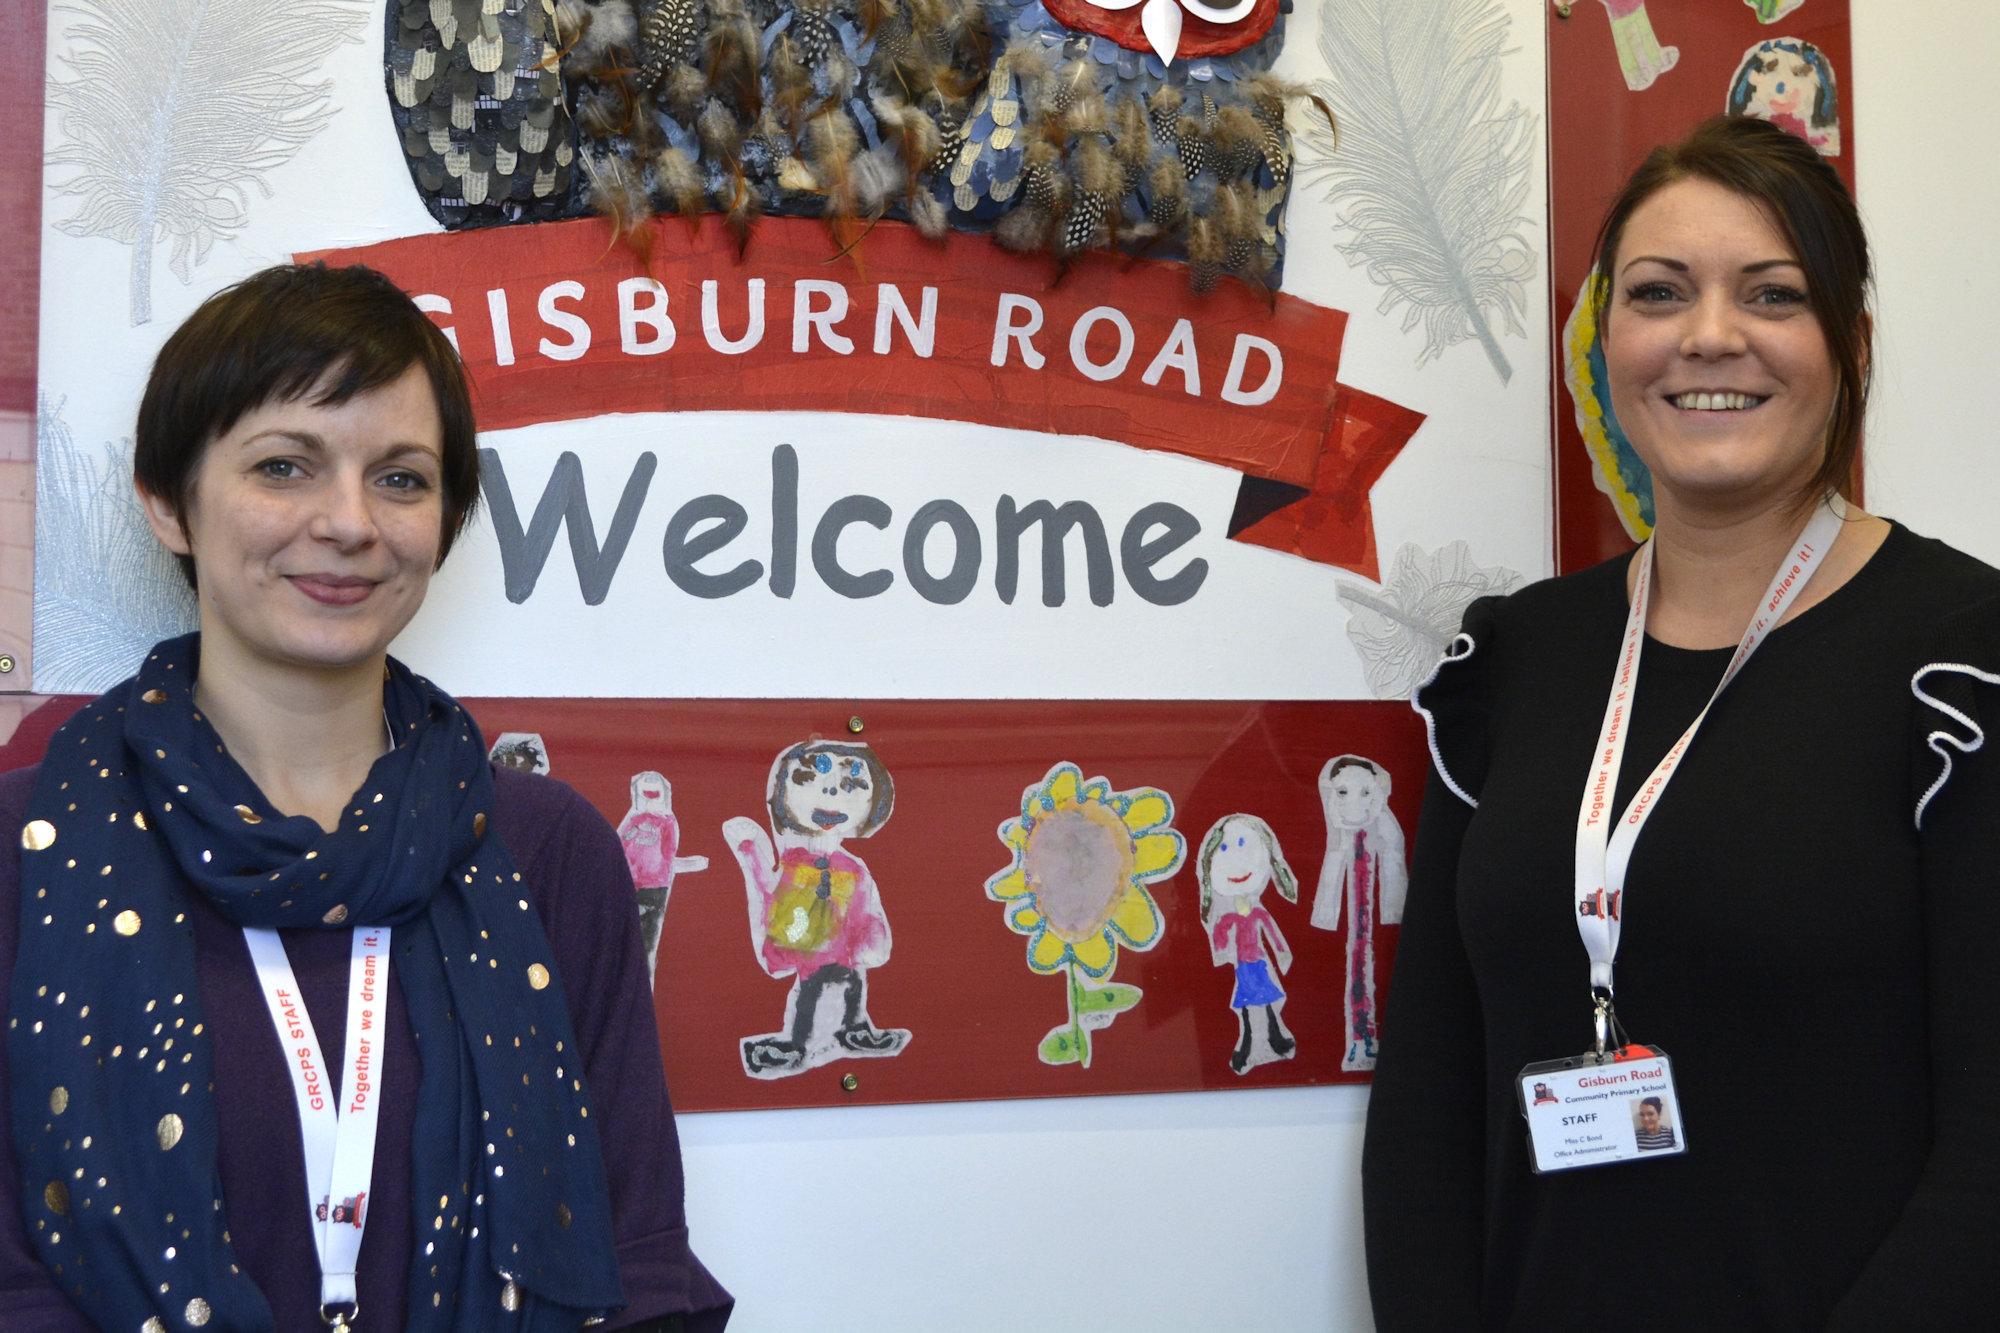 Gisburn Road School Office Team